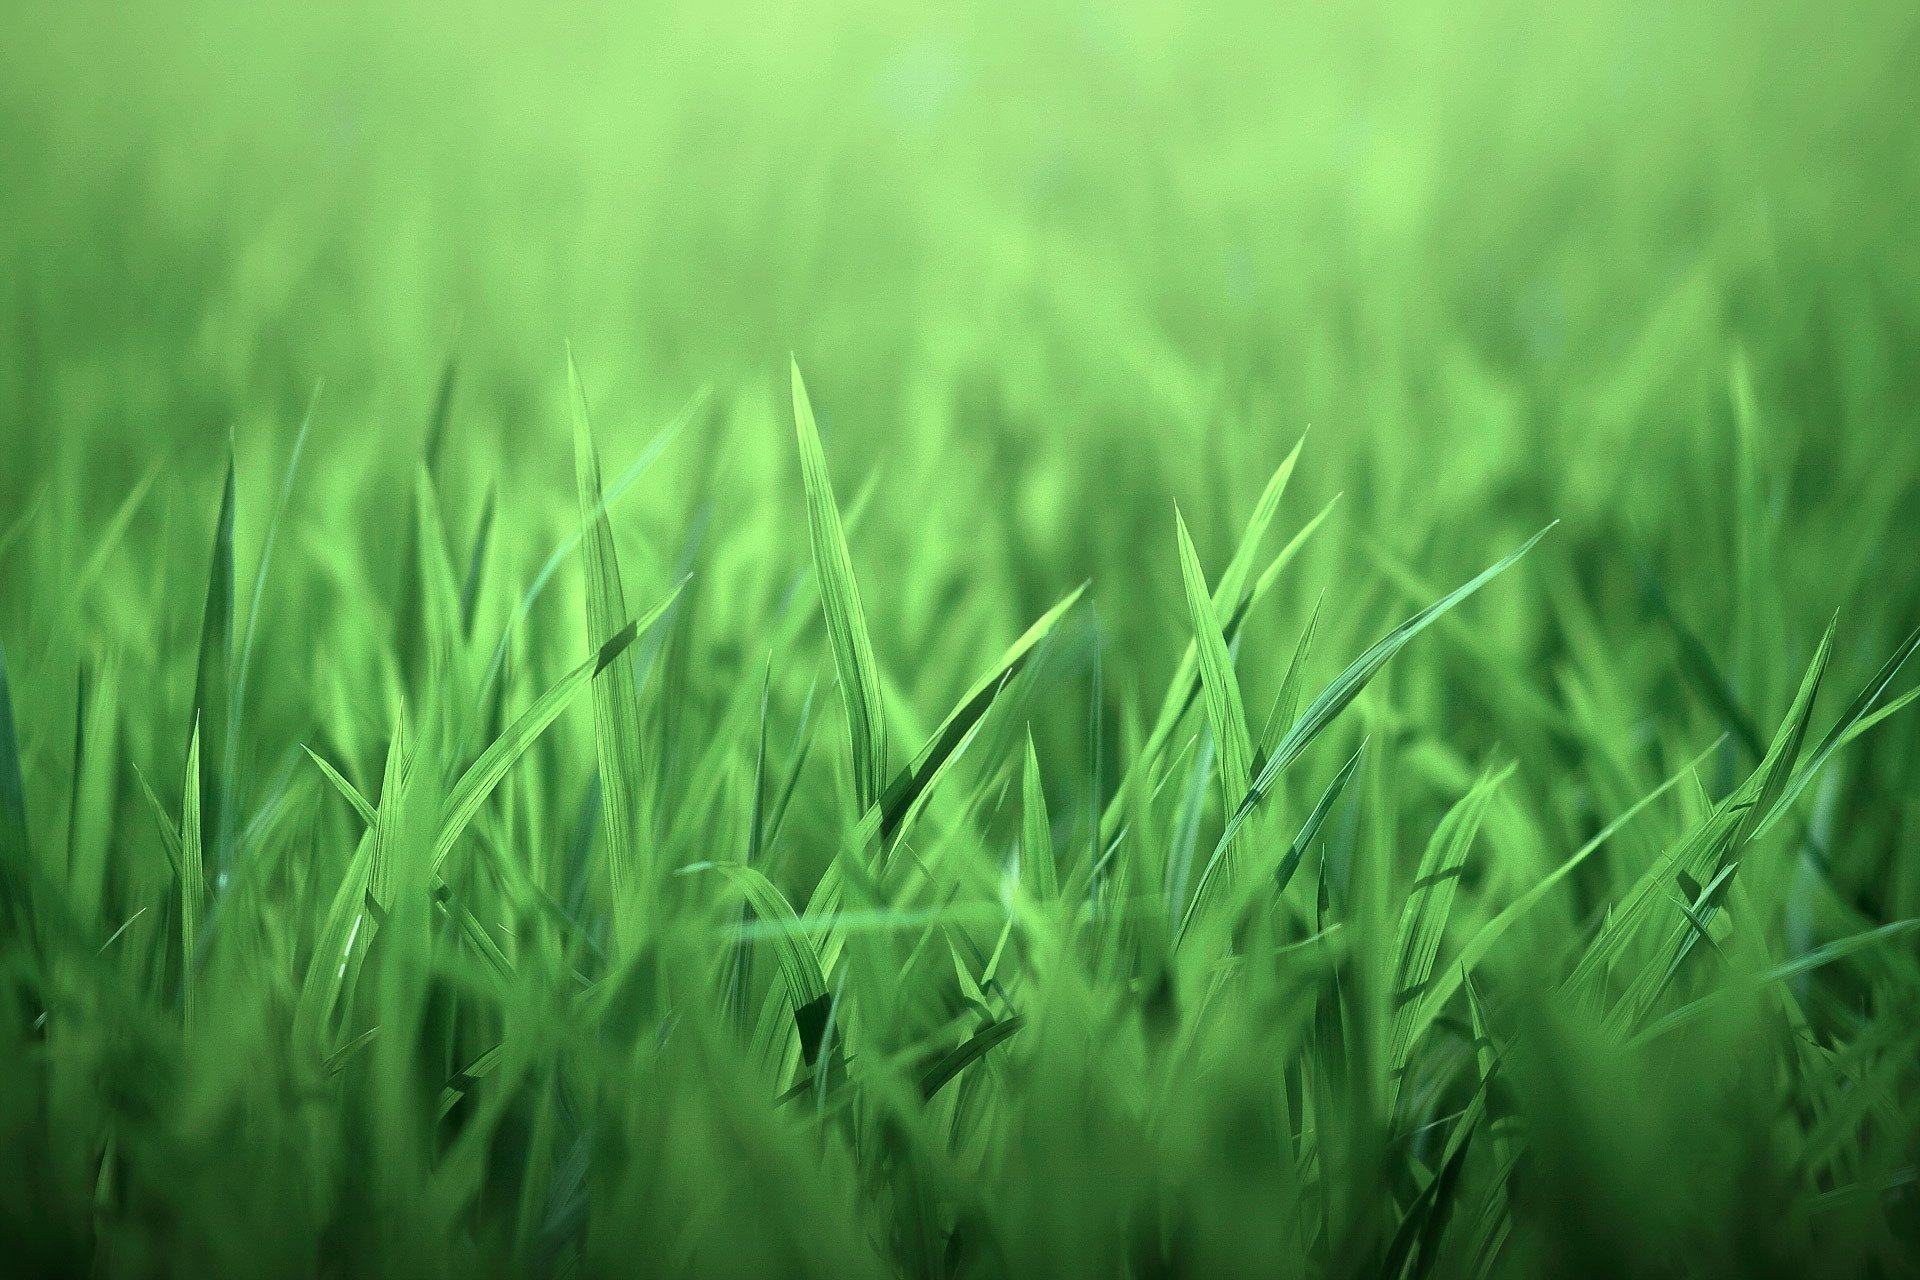 Обои на телефон трава